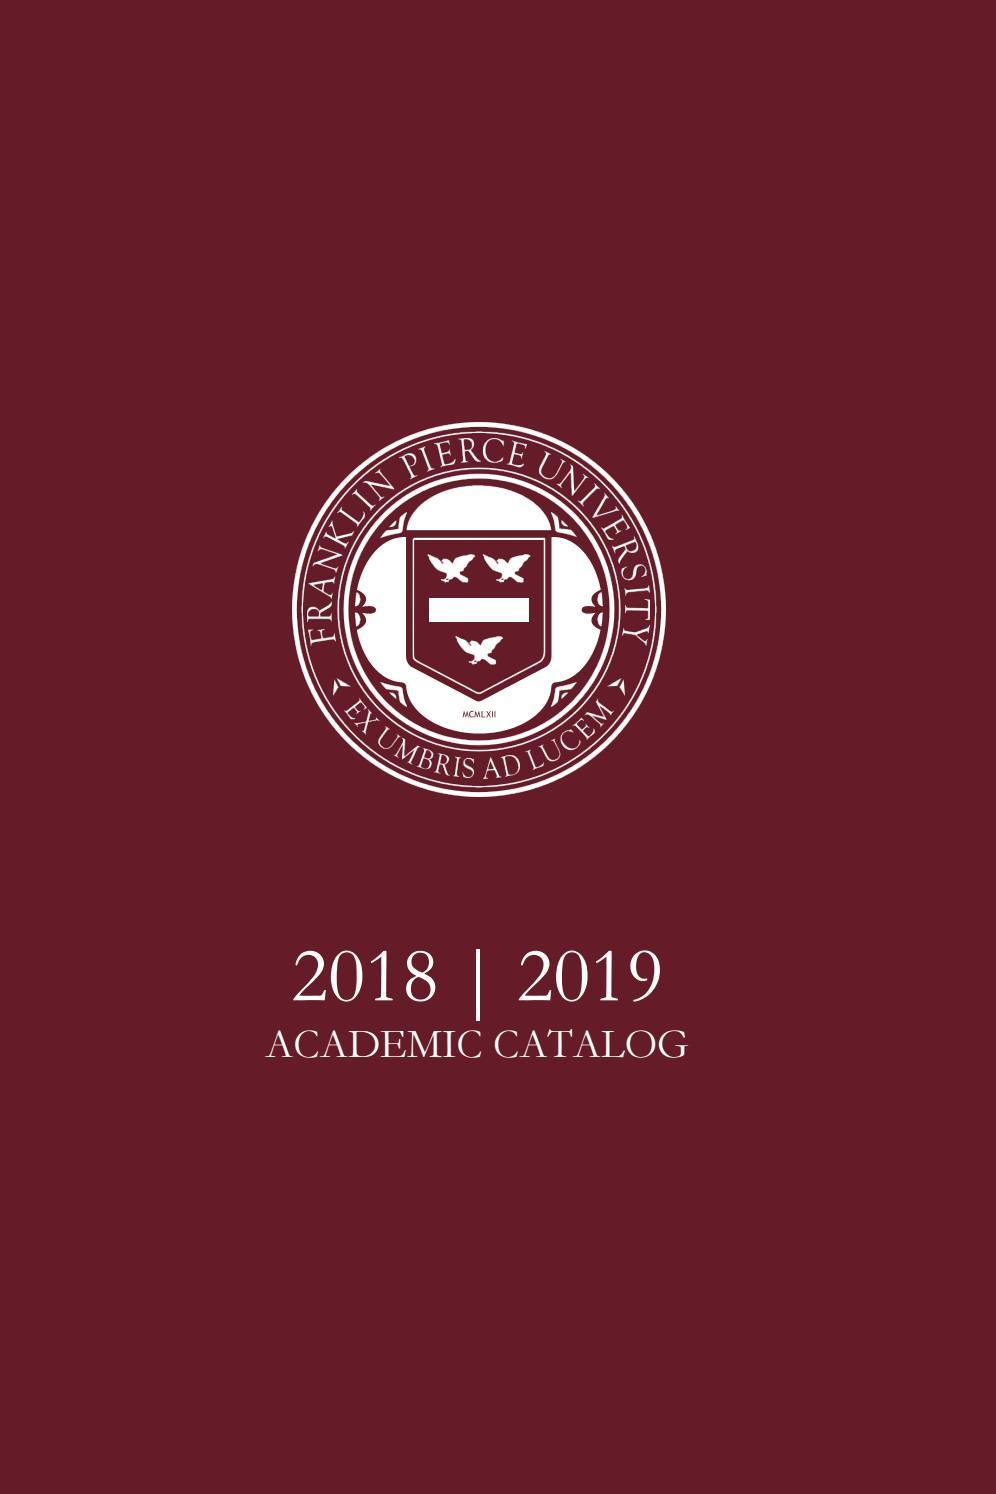 2018-2019 Academic Catalog by Franklin Pierce University - issuu